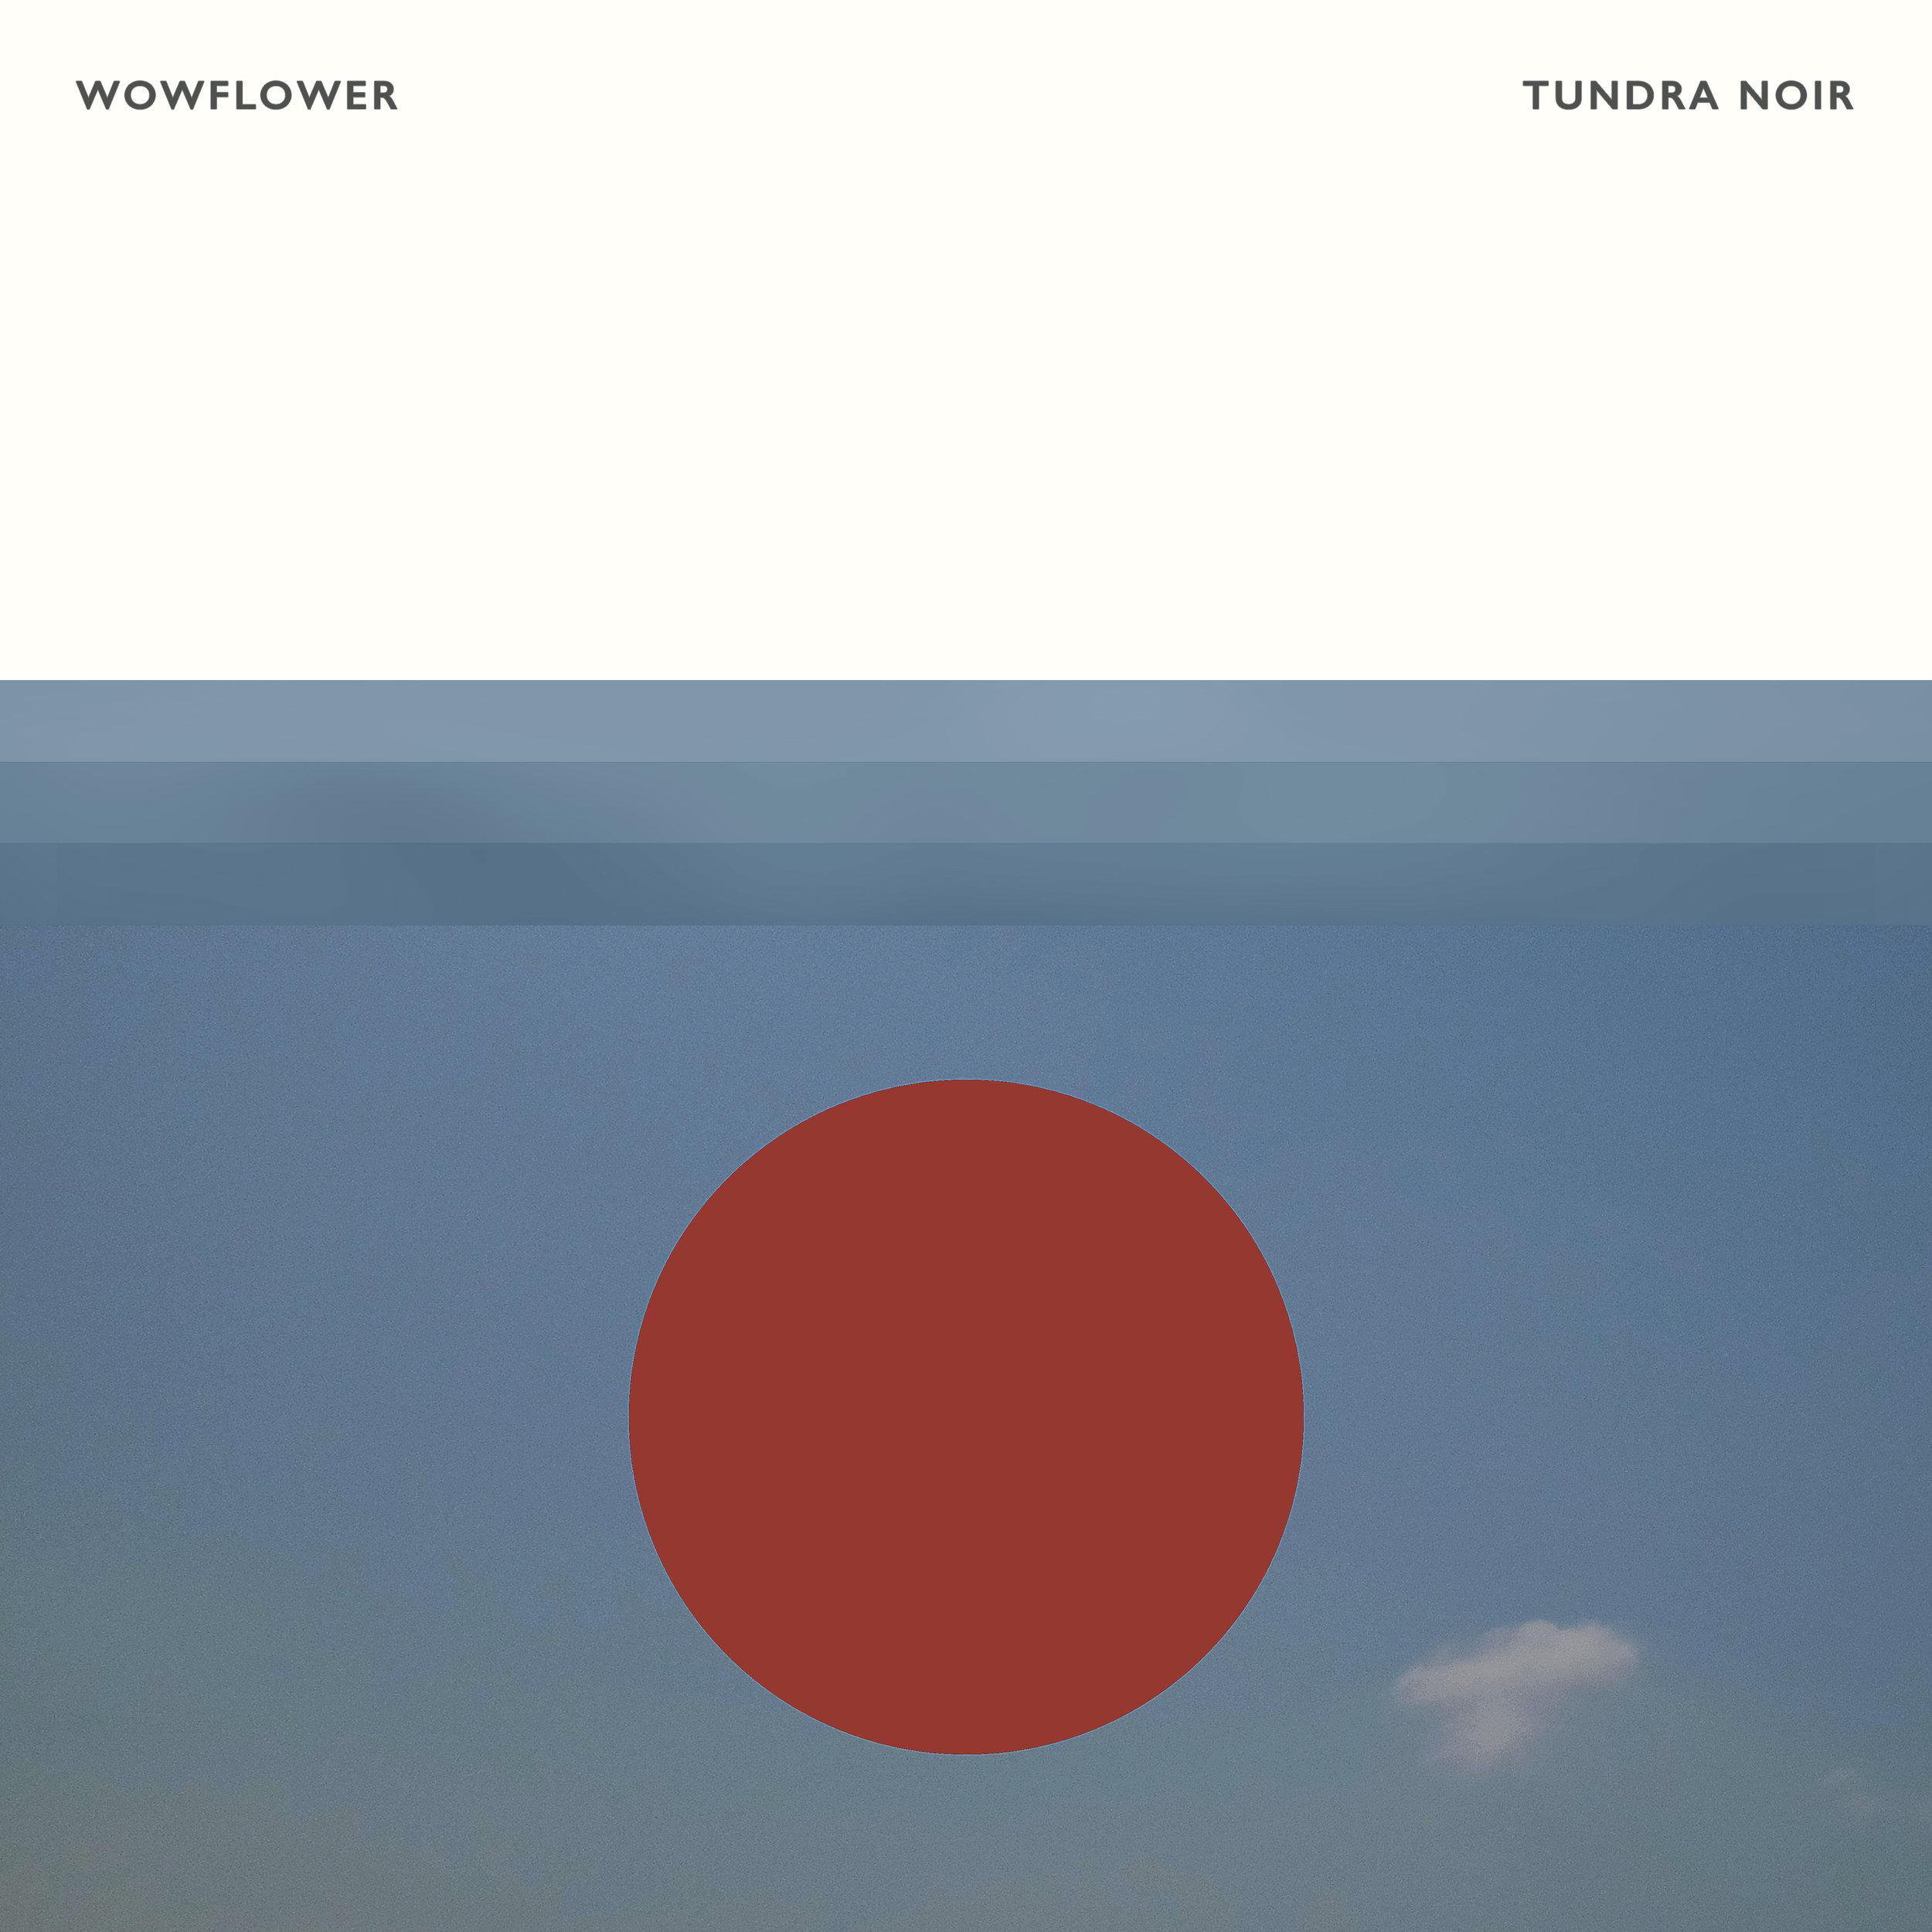 wowflower - tundra noir